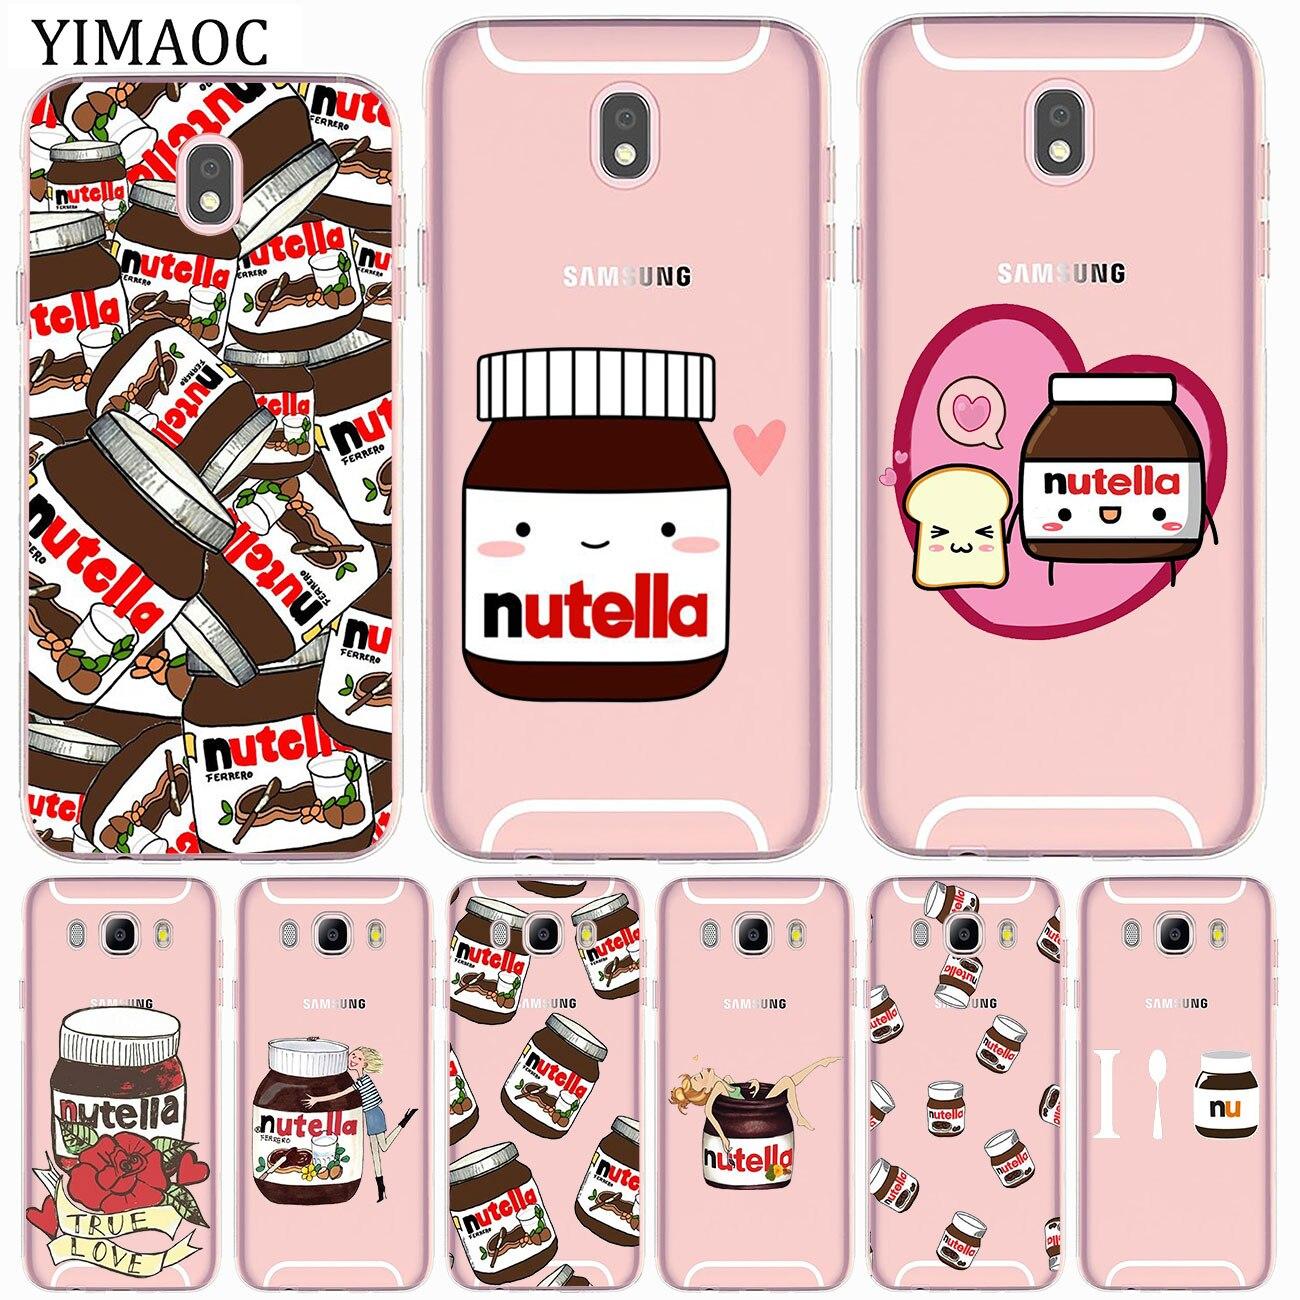 Chocolate comida Tumblr Nutella de silicona suave funda para Samsung Galaxy J8 J7 J6 J5 J4 J3 2017 A2 Core 2016 A5 A9 A8 A7 A6 Plus 2018